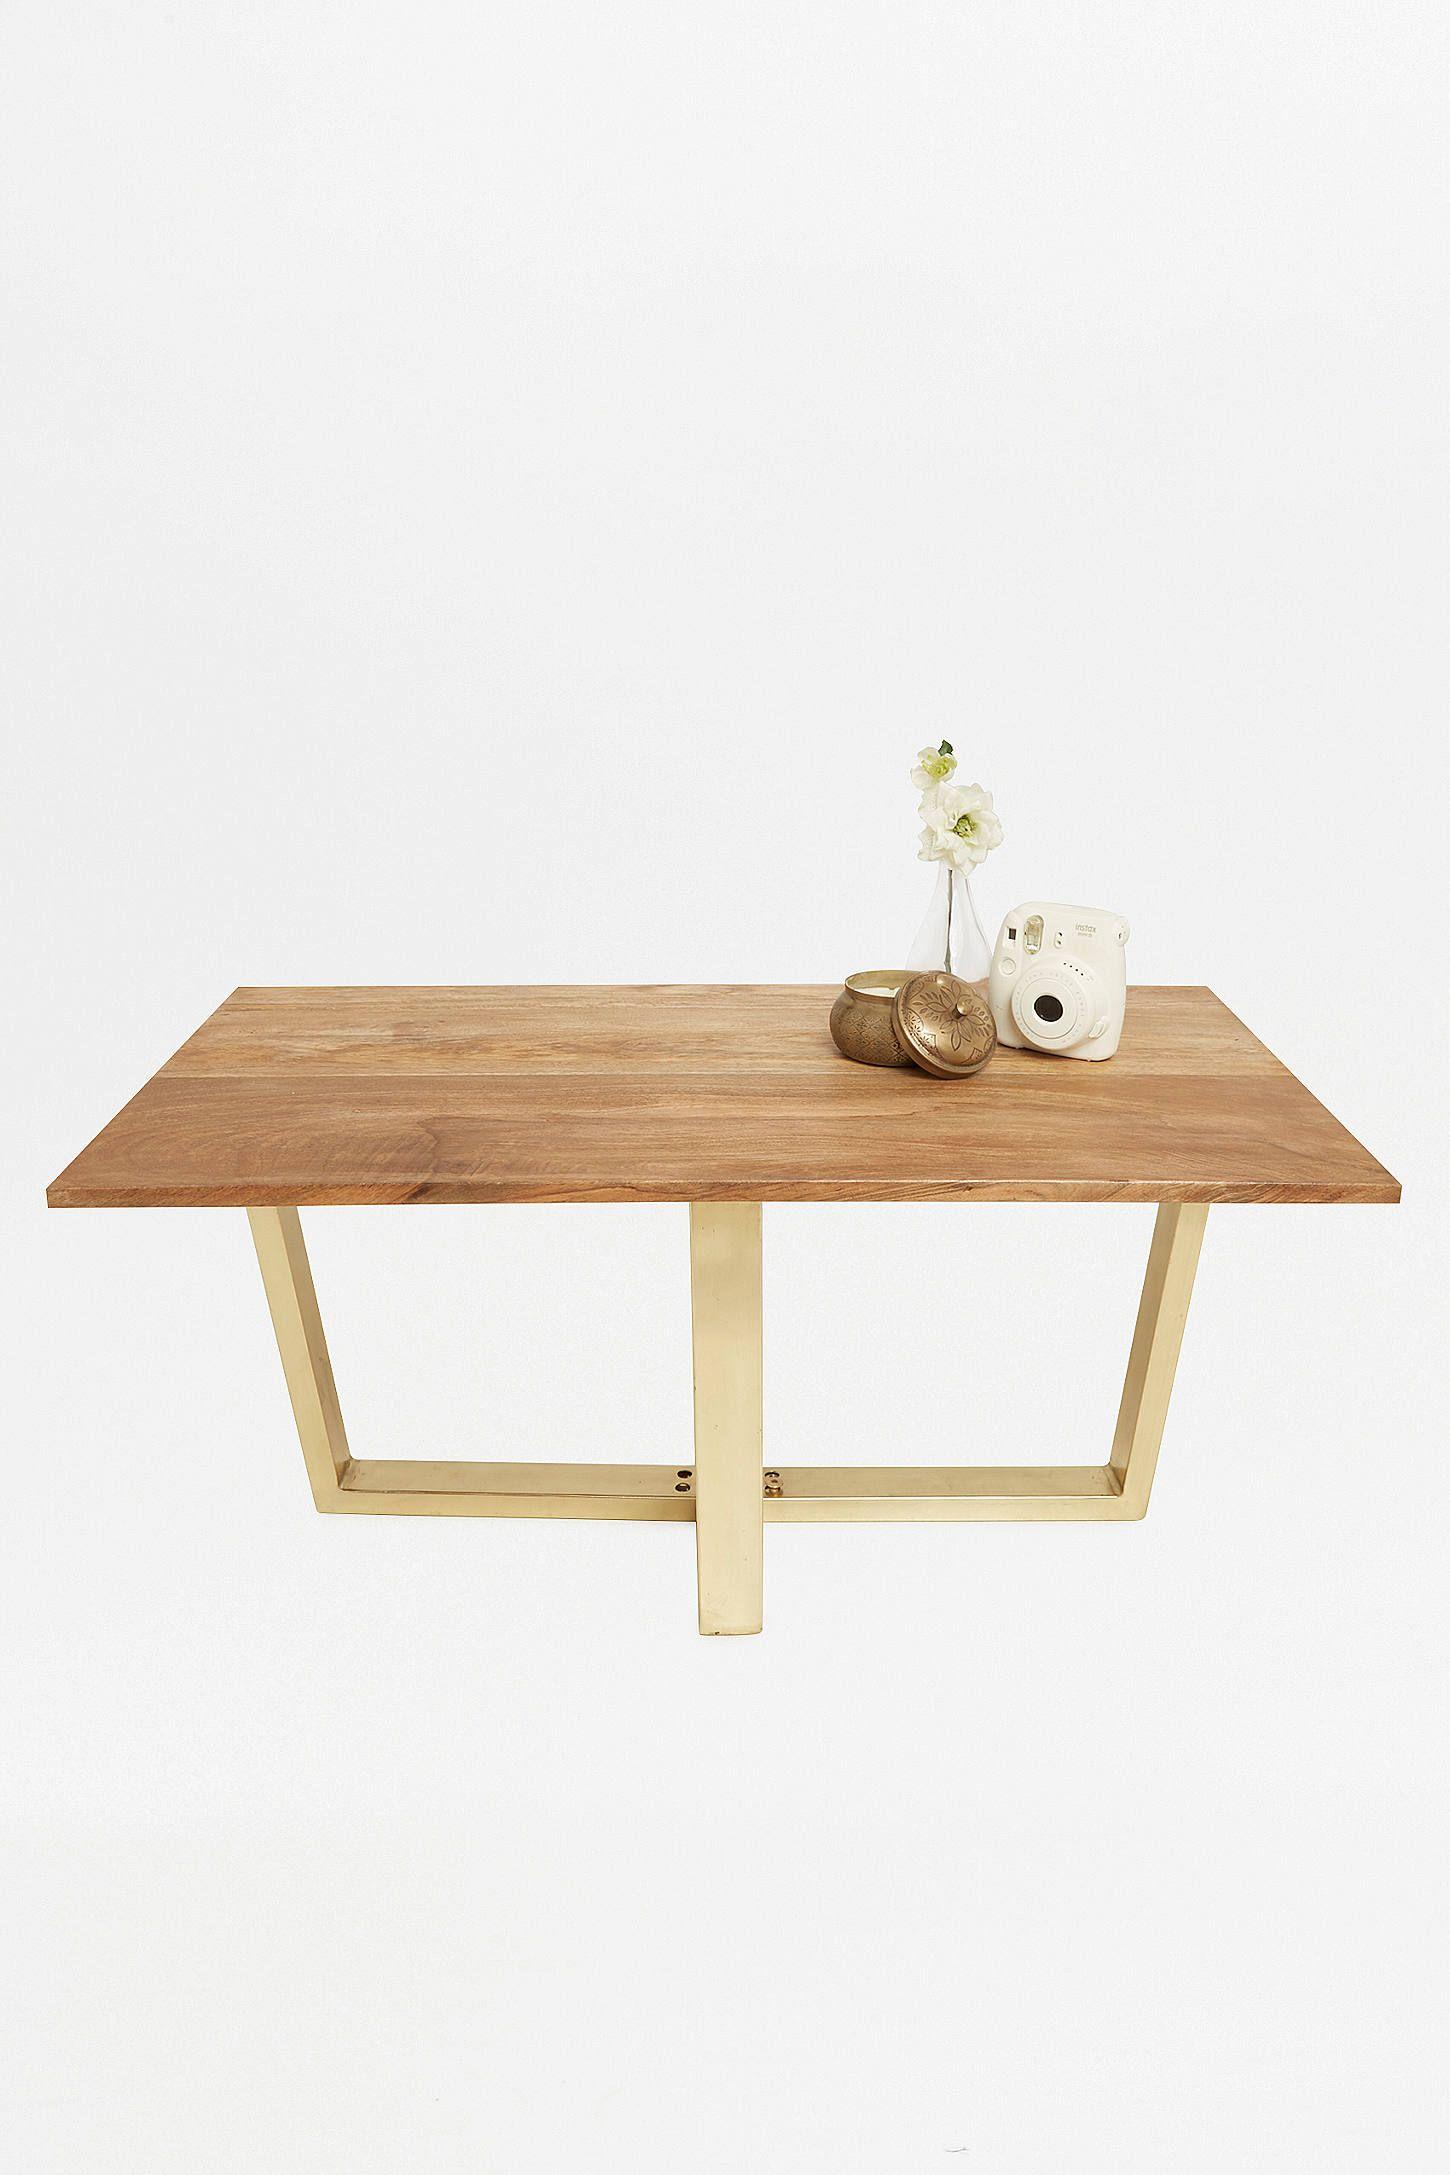 Luxe De Table Basse Rustique Chene Massif Concept